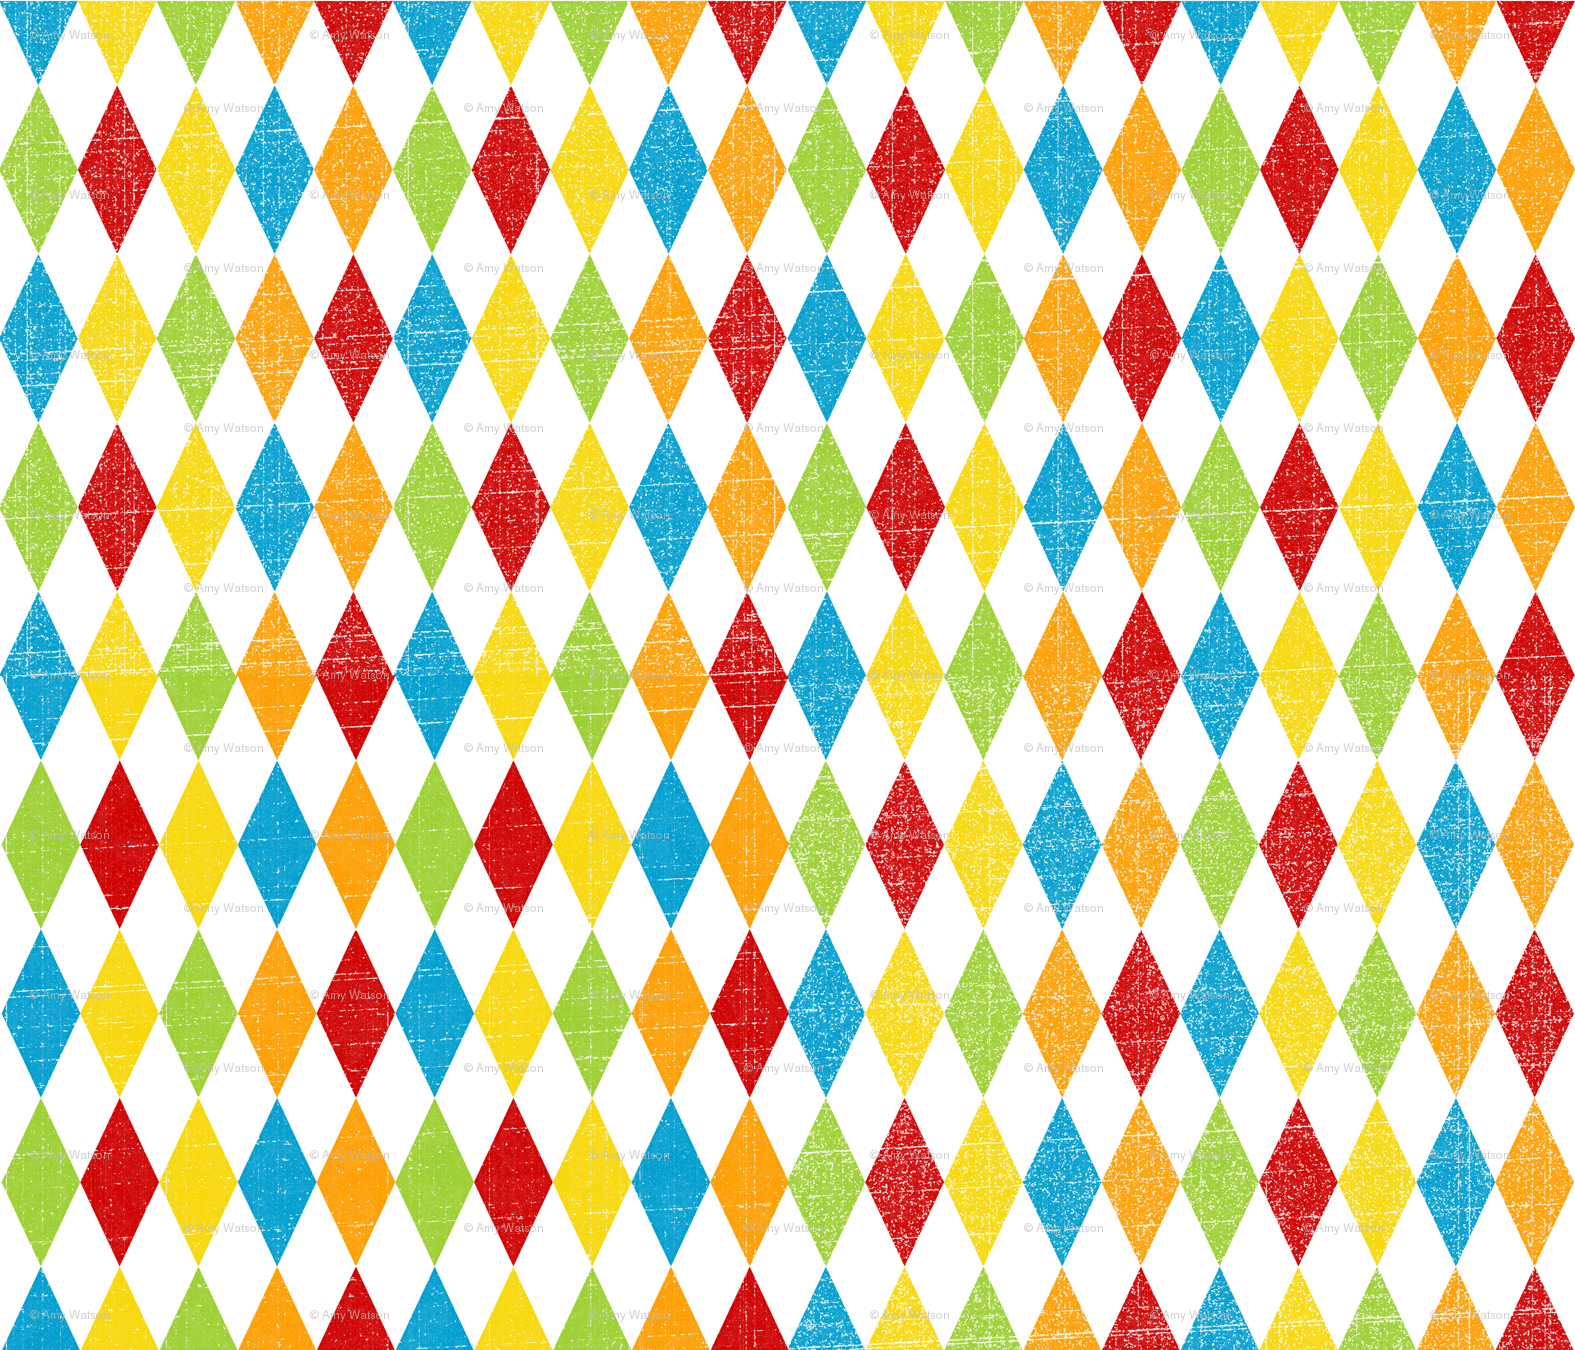 circus patterns printable - photo #1